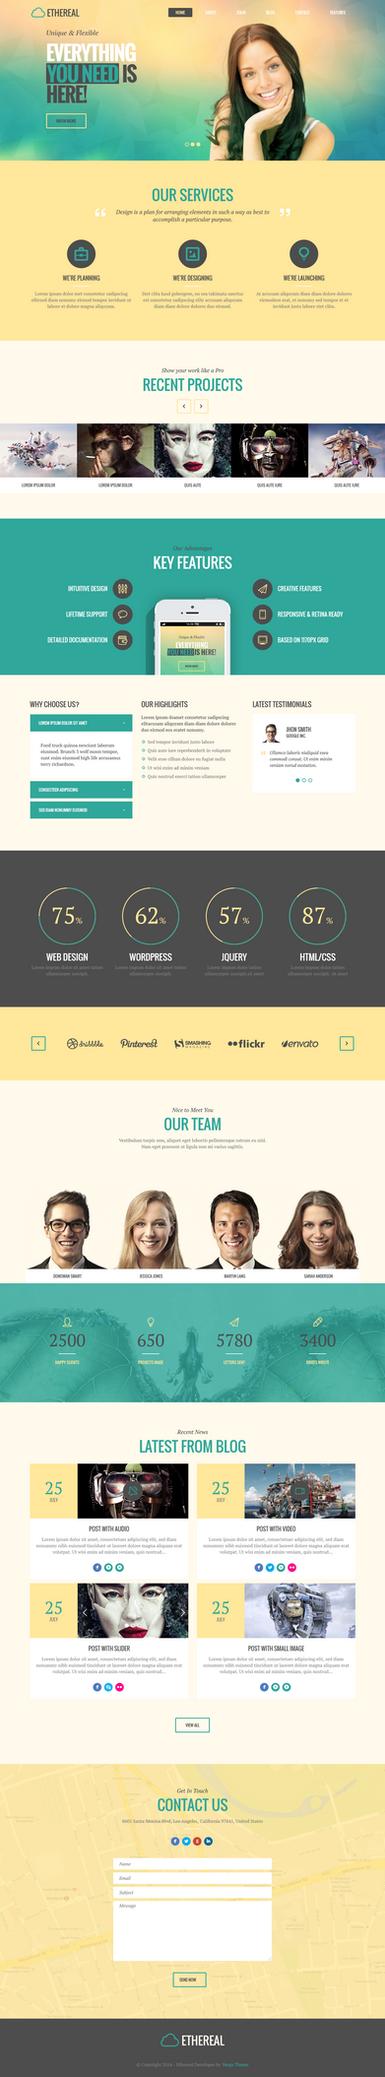 Ethereal - Multipurpose Parallax WordPress Theme by webdesigngeek